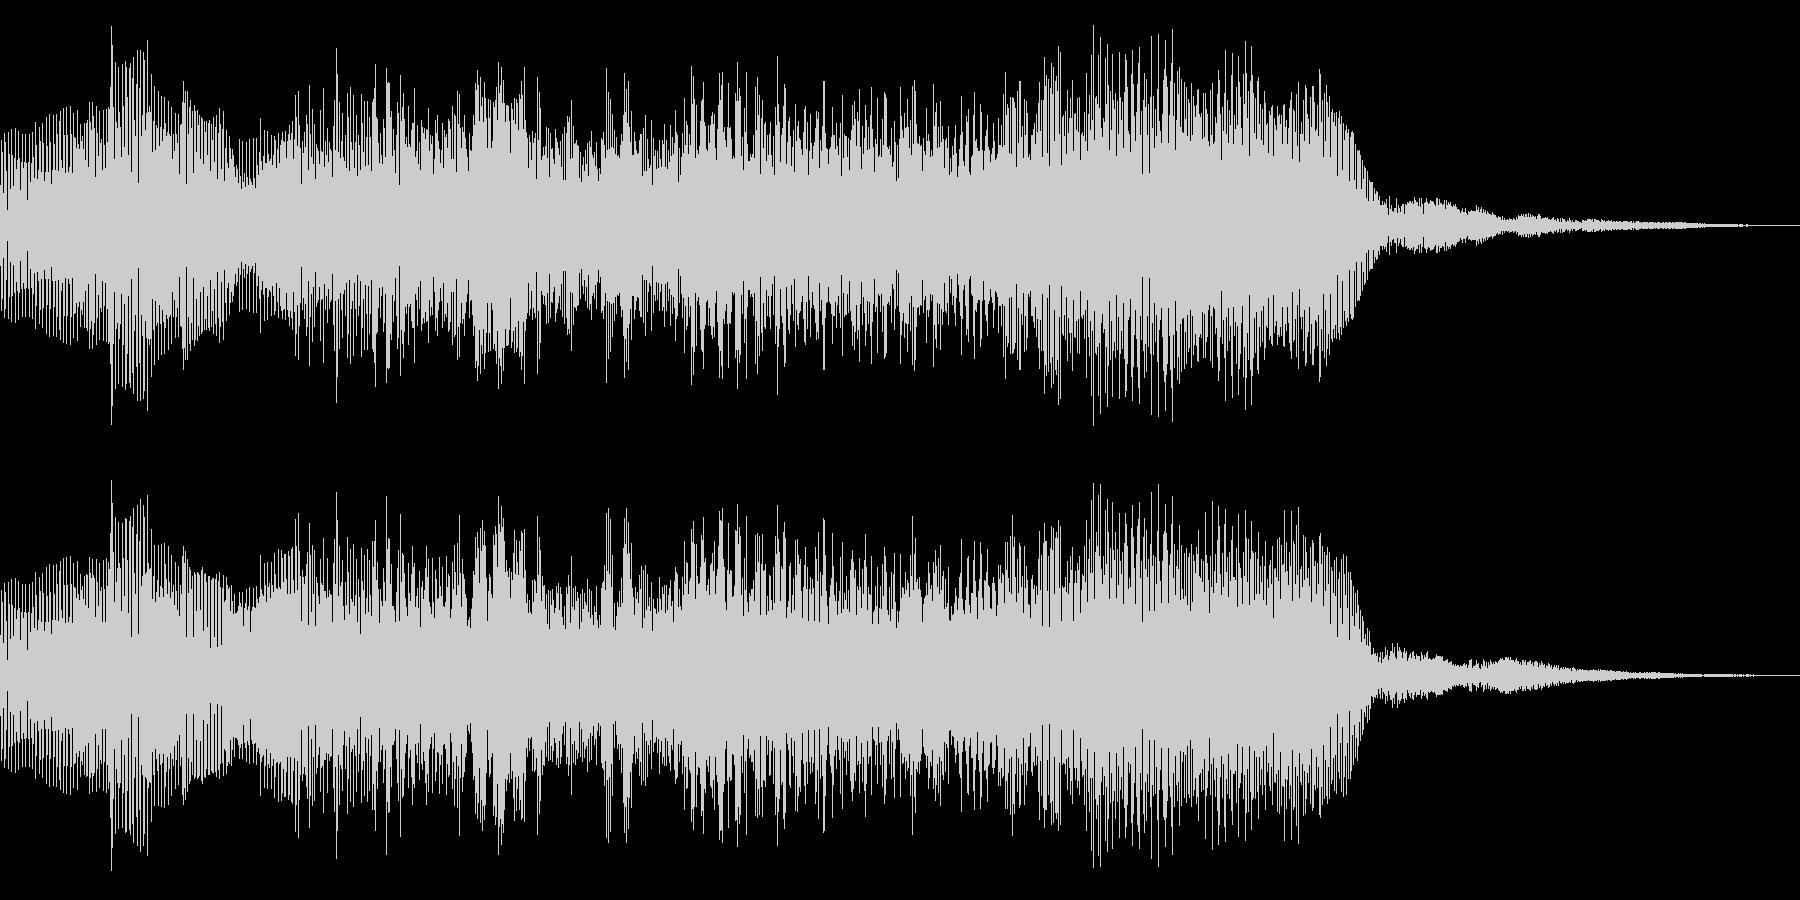 8bit ファミコン風 ゲームクリア の未再生の波形